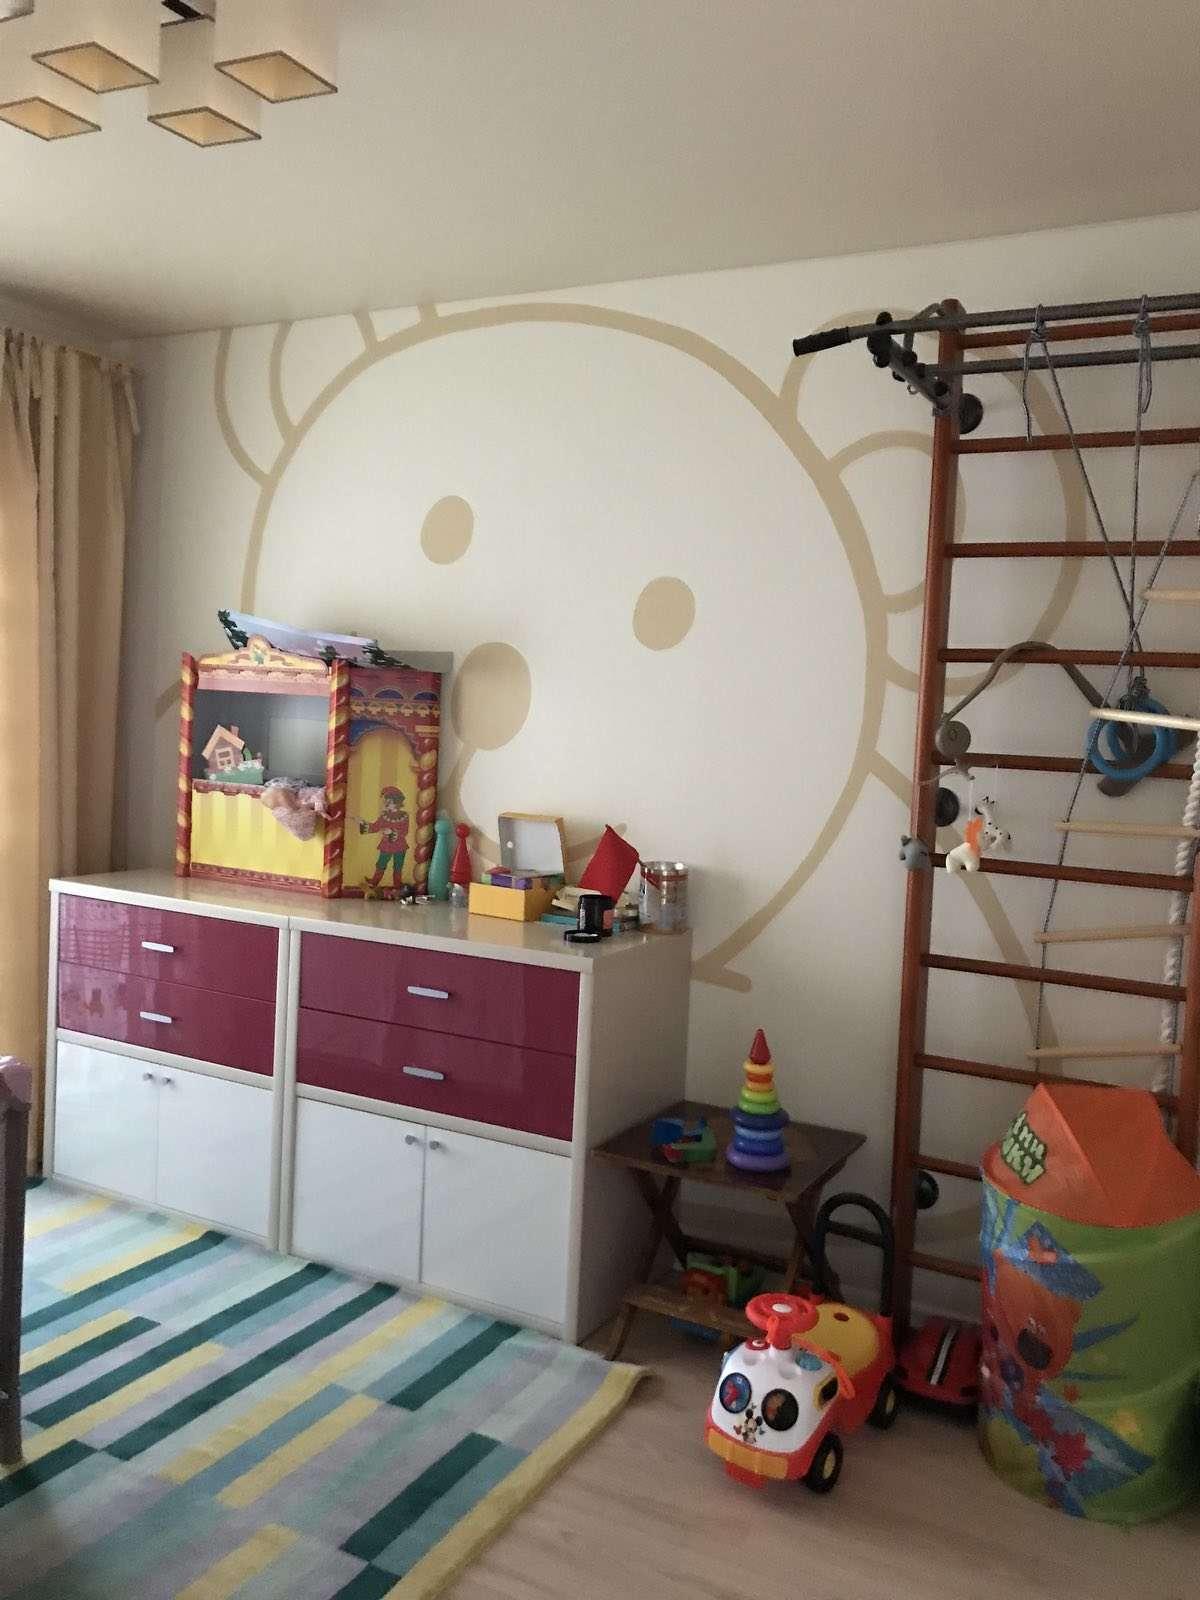 Продаётся 3-комнатная квартира 122.0 кв.м. этаж 10/22 за 11 500 000 руб